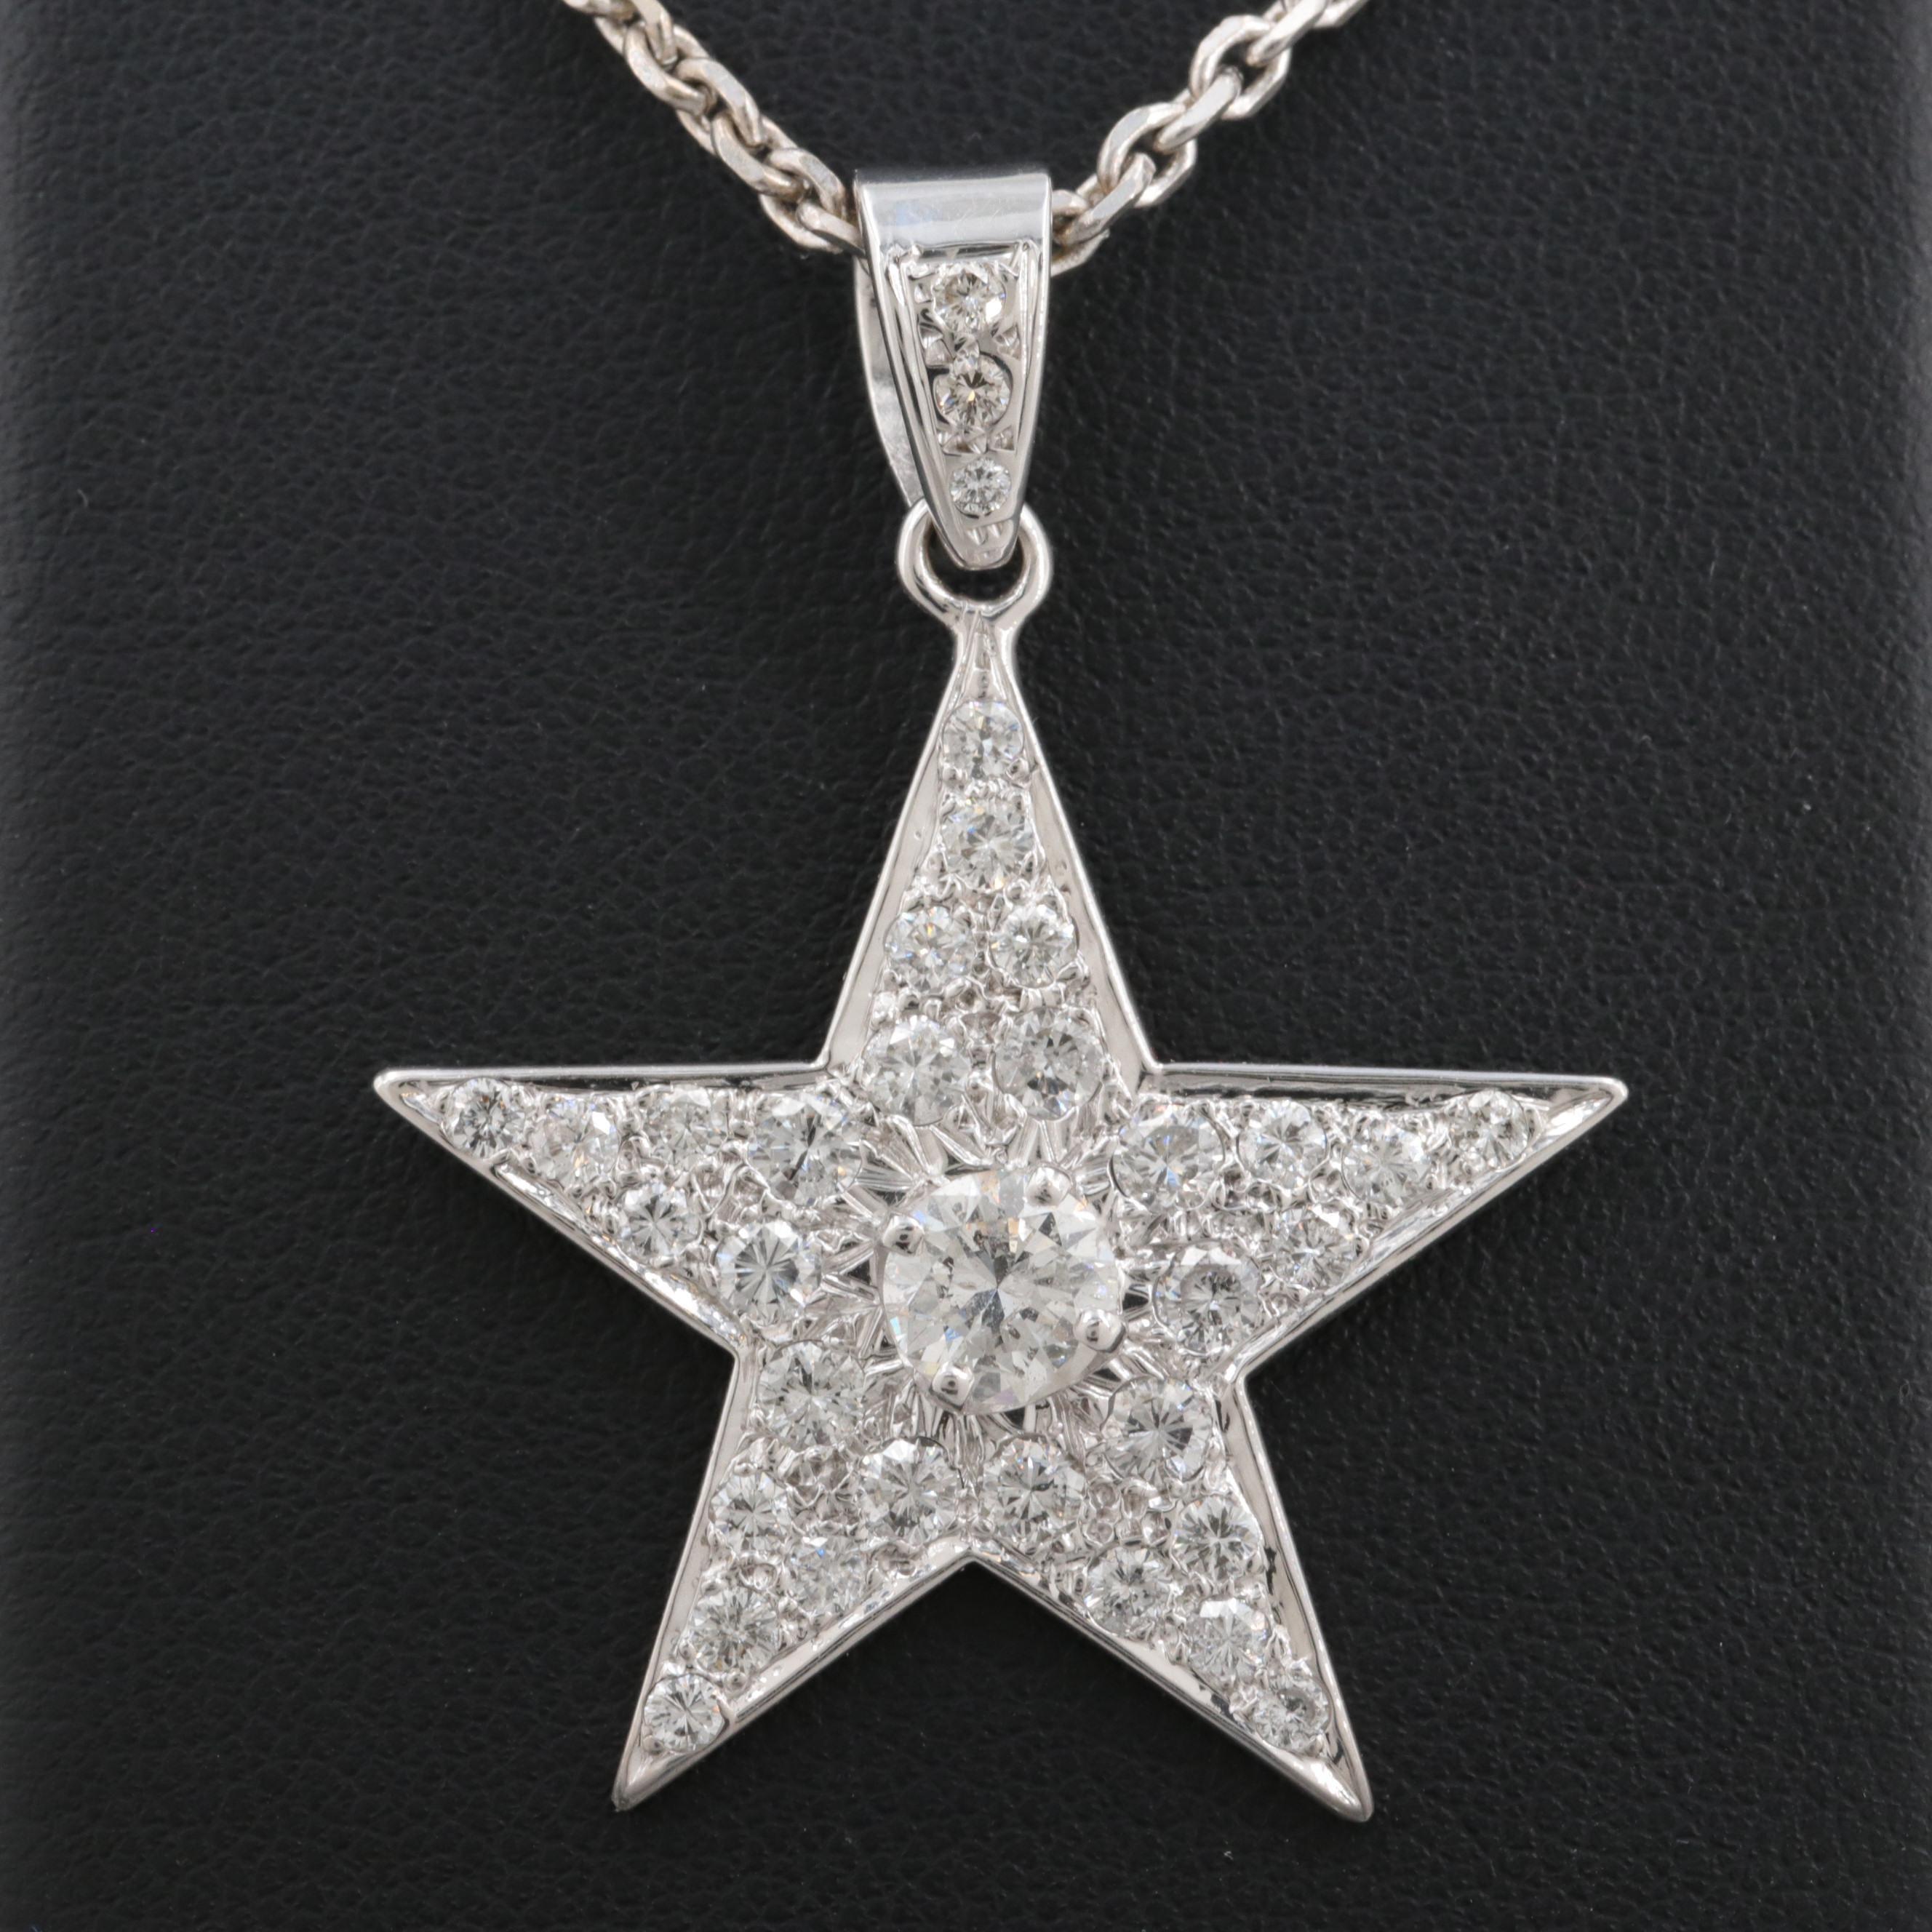 14K White Gold 2.28 CTW Diamond Star Pendant Necklace